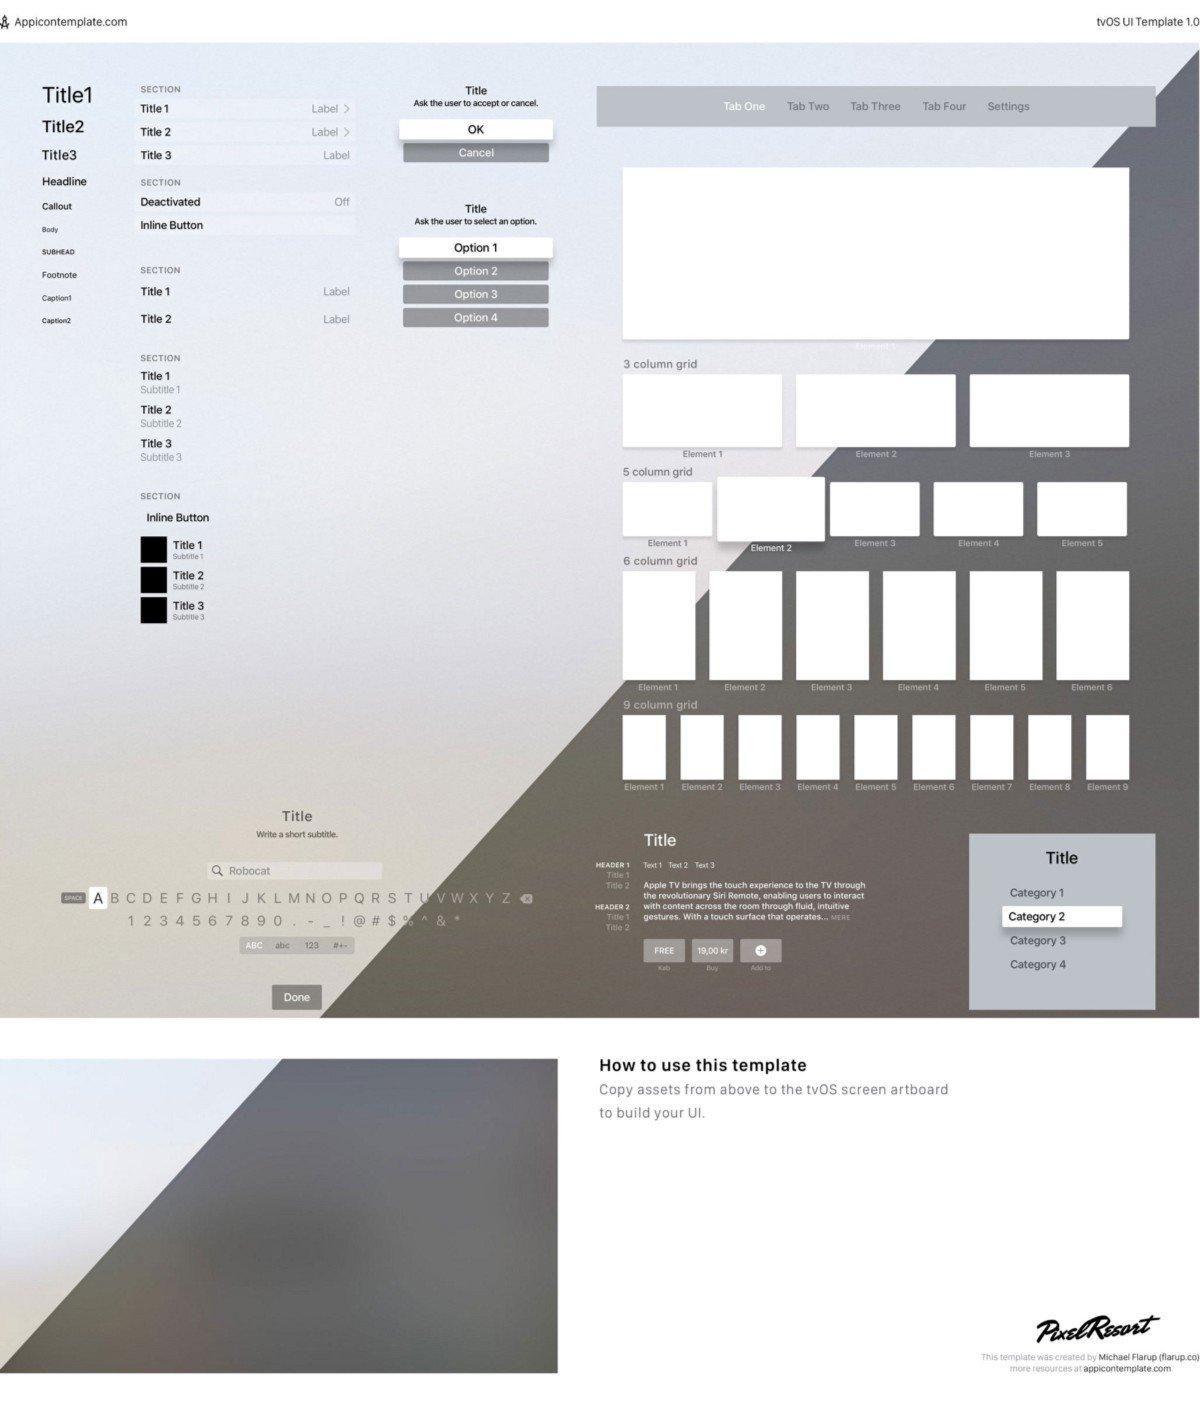 atv-template